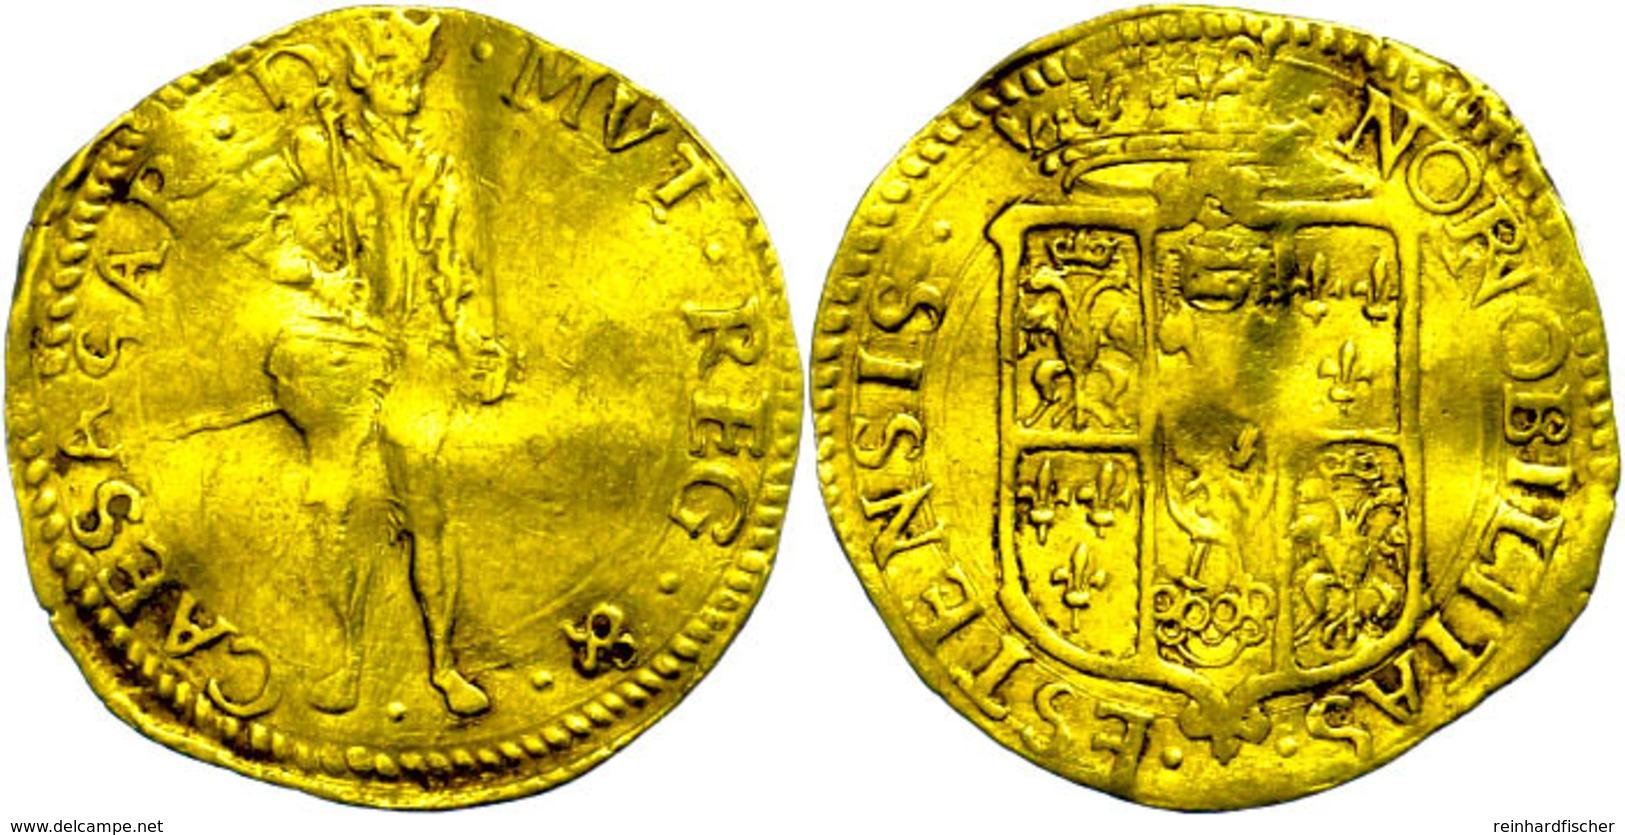 534 Modena, Dukat (3,35g), O.J. (1598-1628), Cesare D'Este, Nach Ungarischem Vorbild, Fb. 763, Wellig, S-ss.  S-ss - Italy